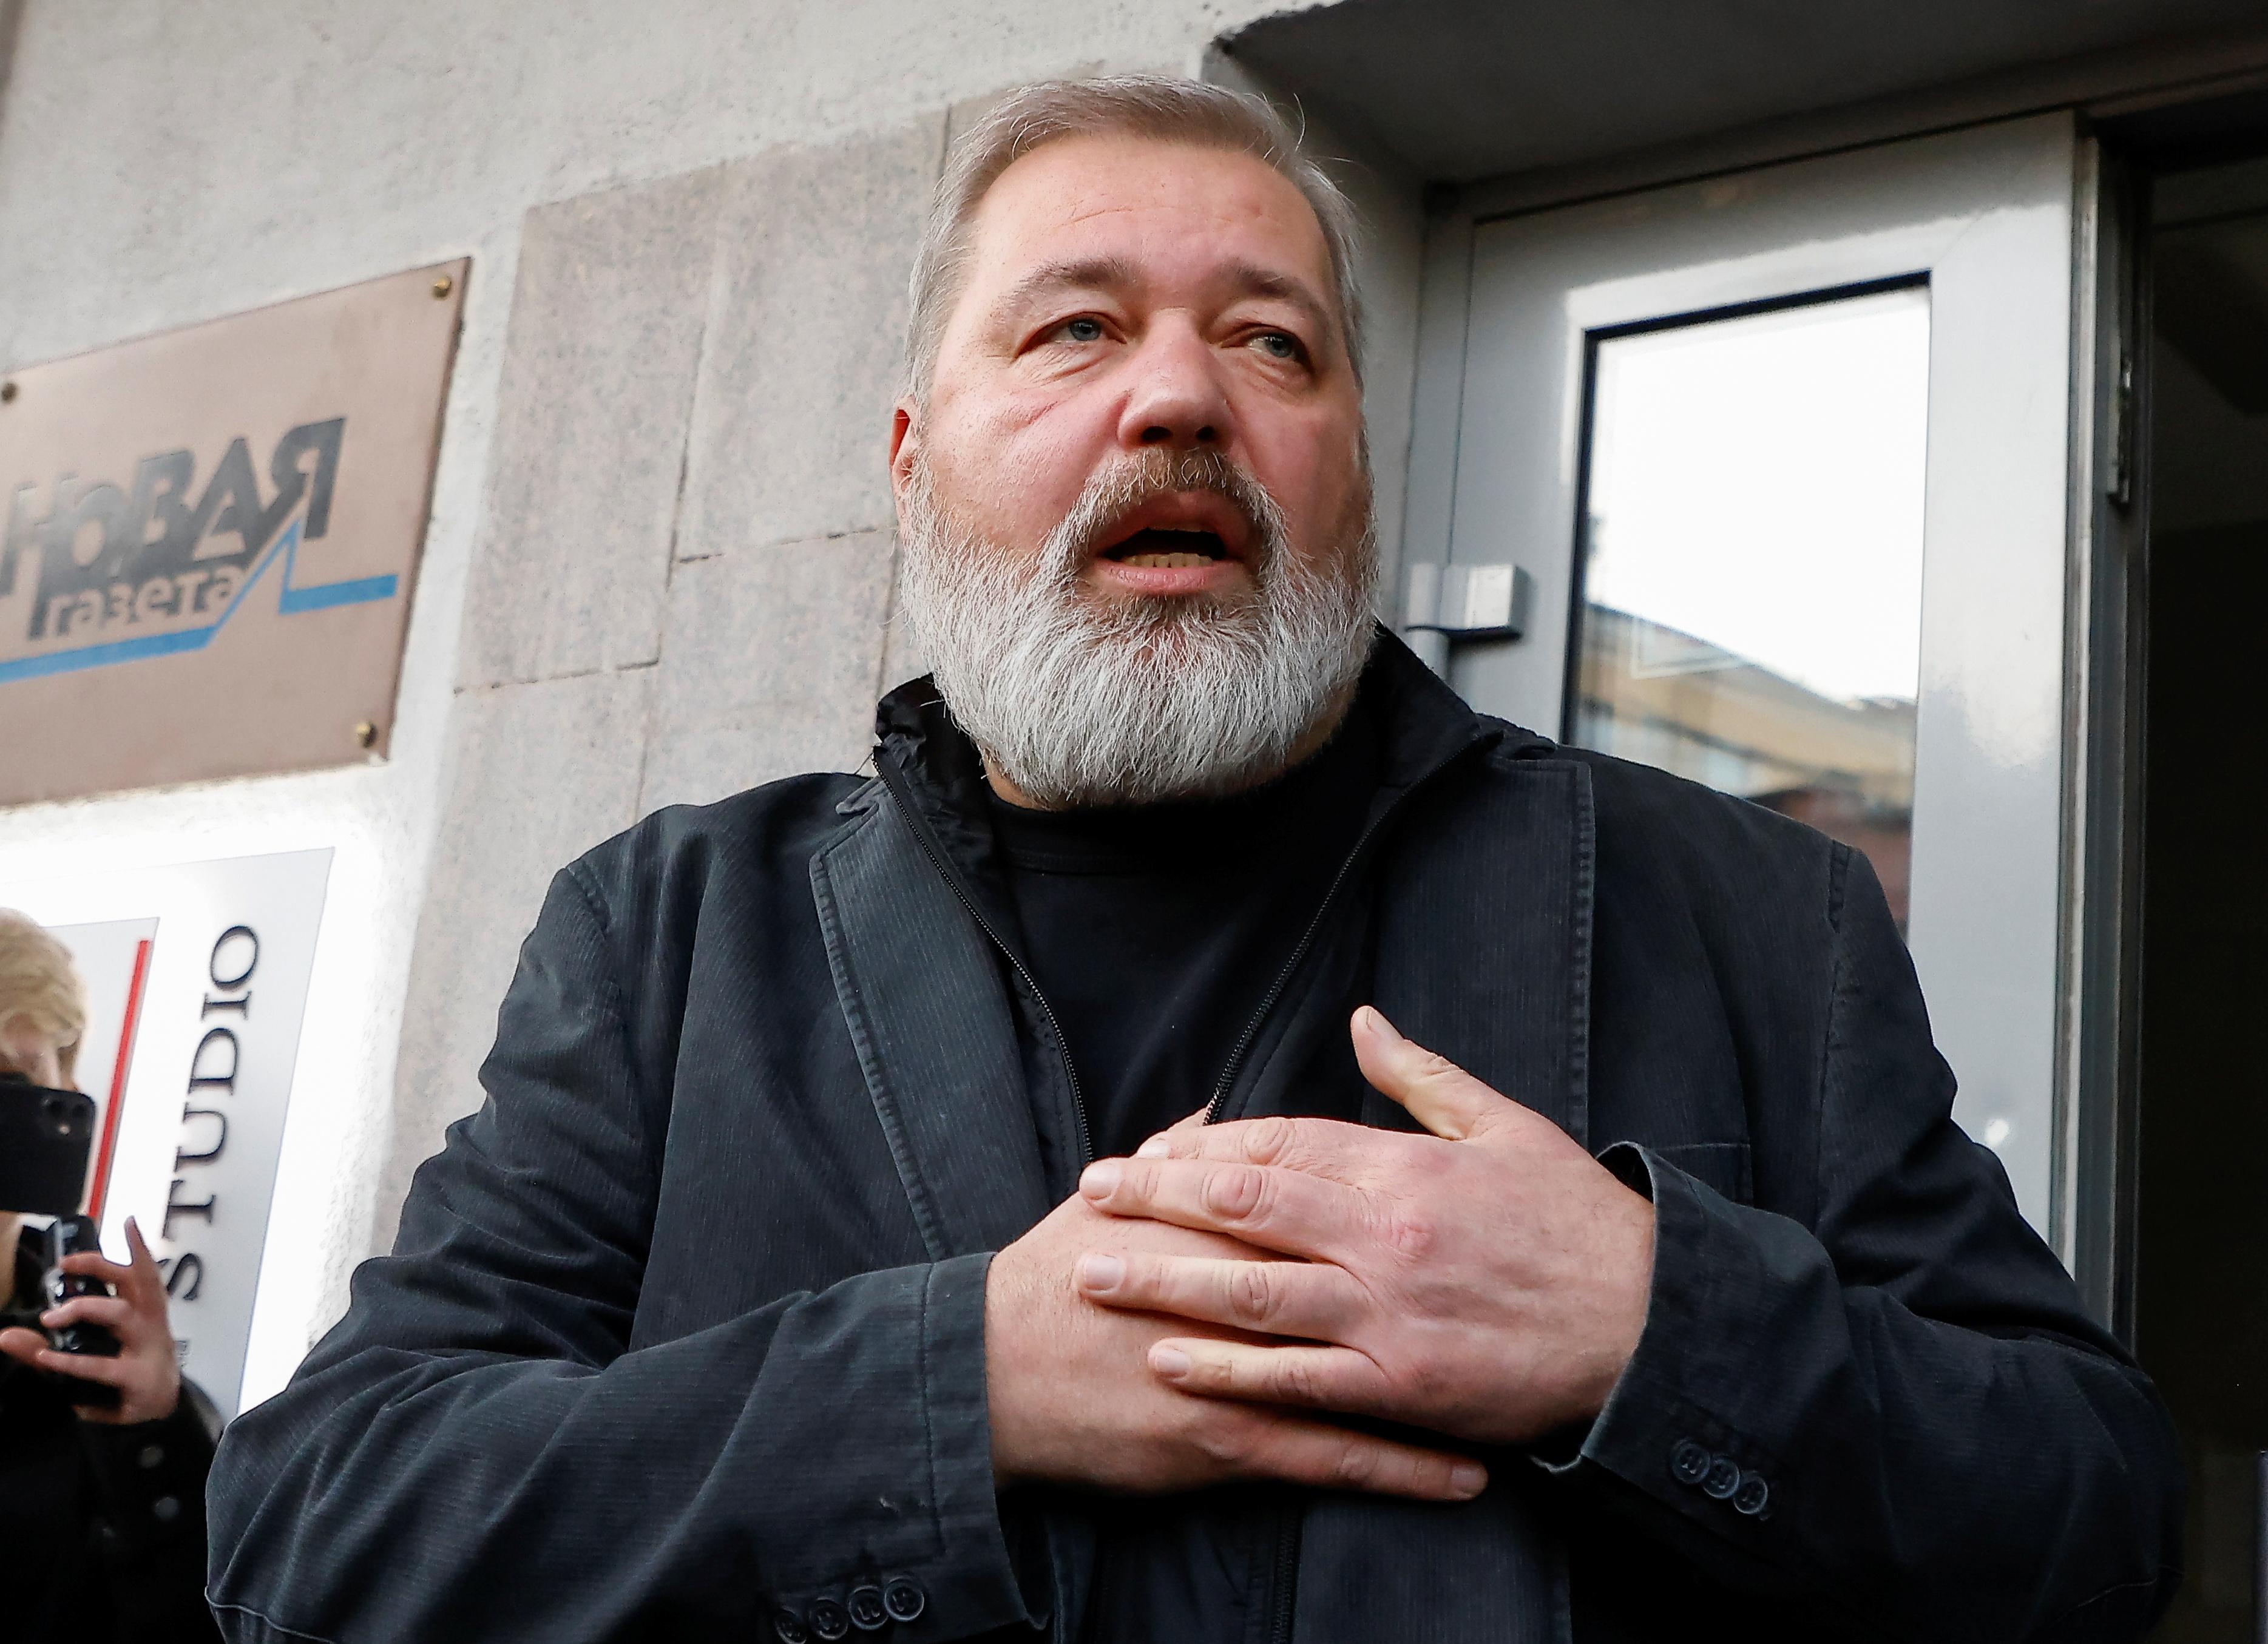 Russian investigative newspaper Novaya Gazeta's editor-in-chief Dmitry Muratov reacts as he meets journalists in Moscow, Russia October 8, 2021.  REUTERS/Maxim Shemetov